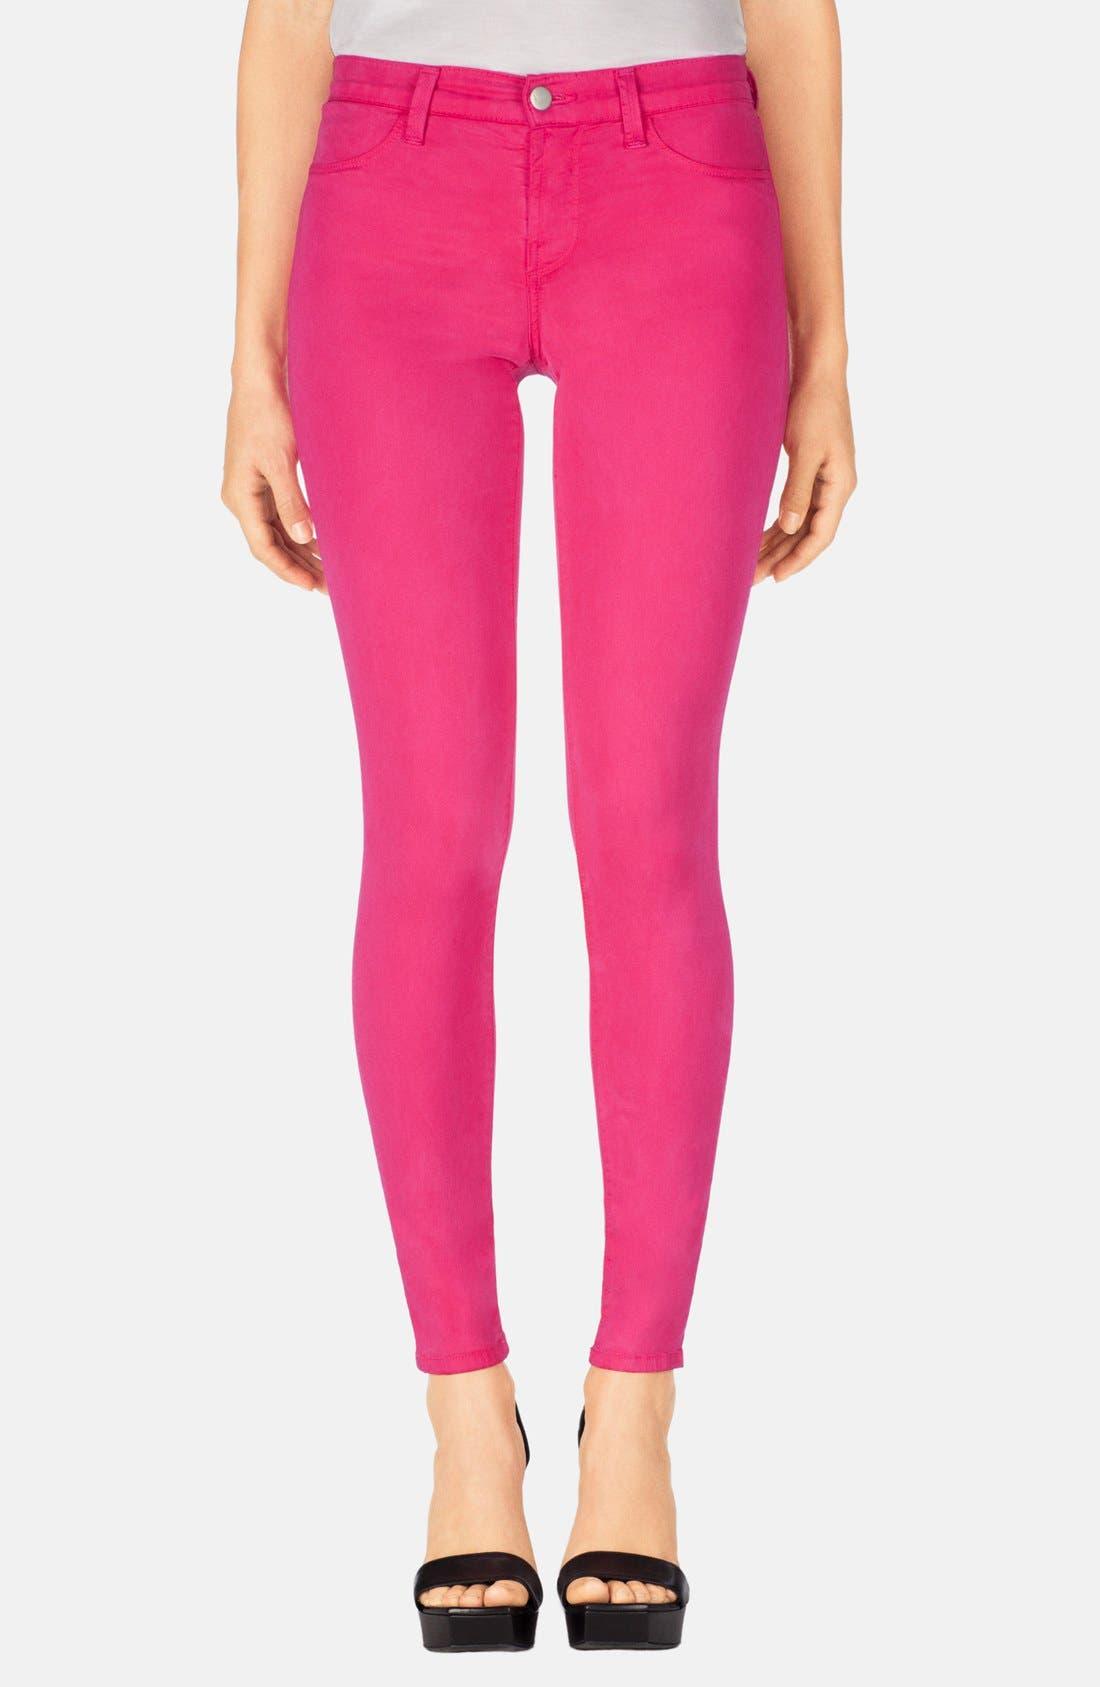 Main Image - J Brand '485' Mid Rise Super Skinny Jeans (Wildflower)